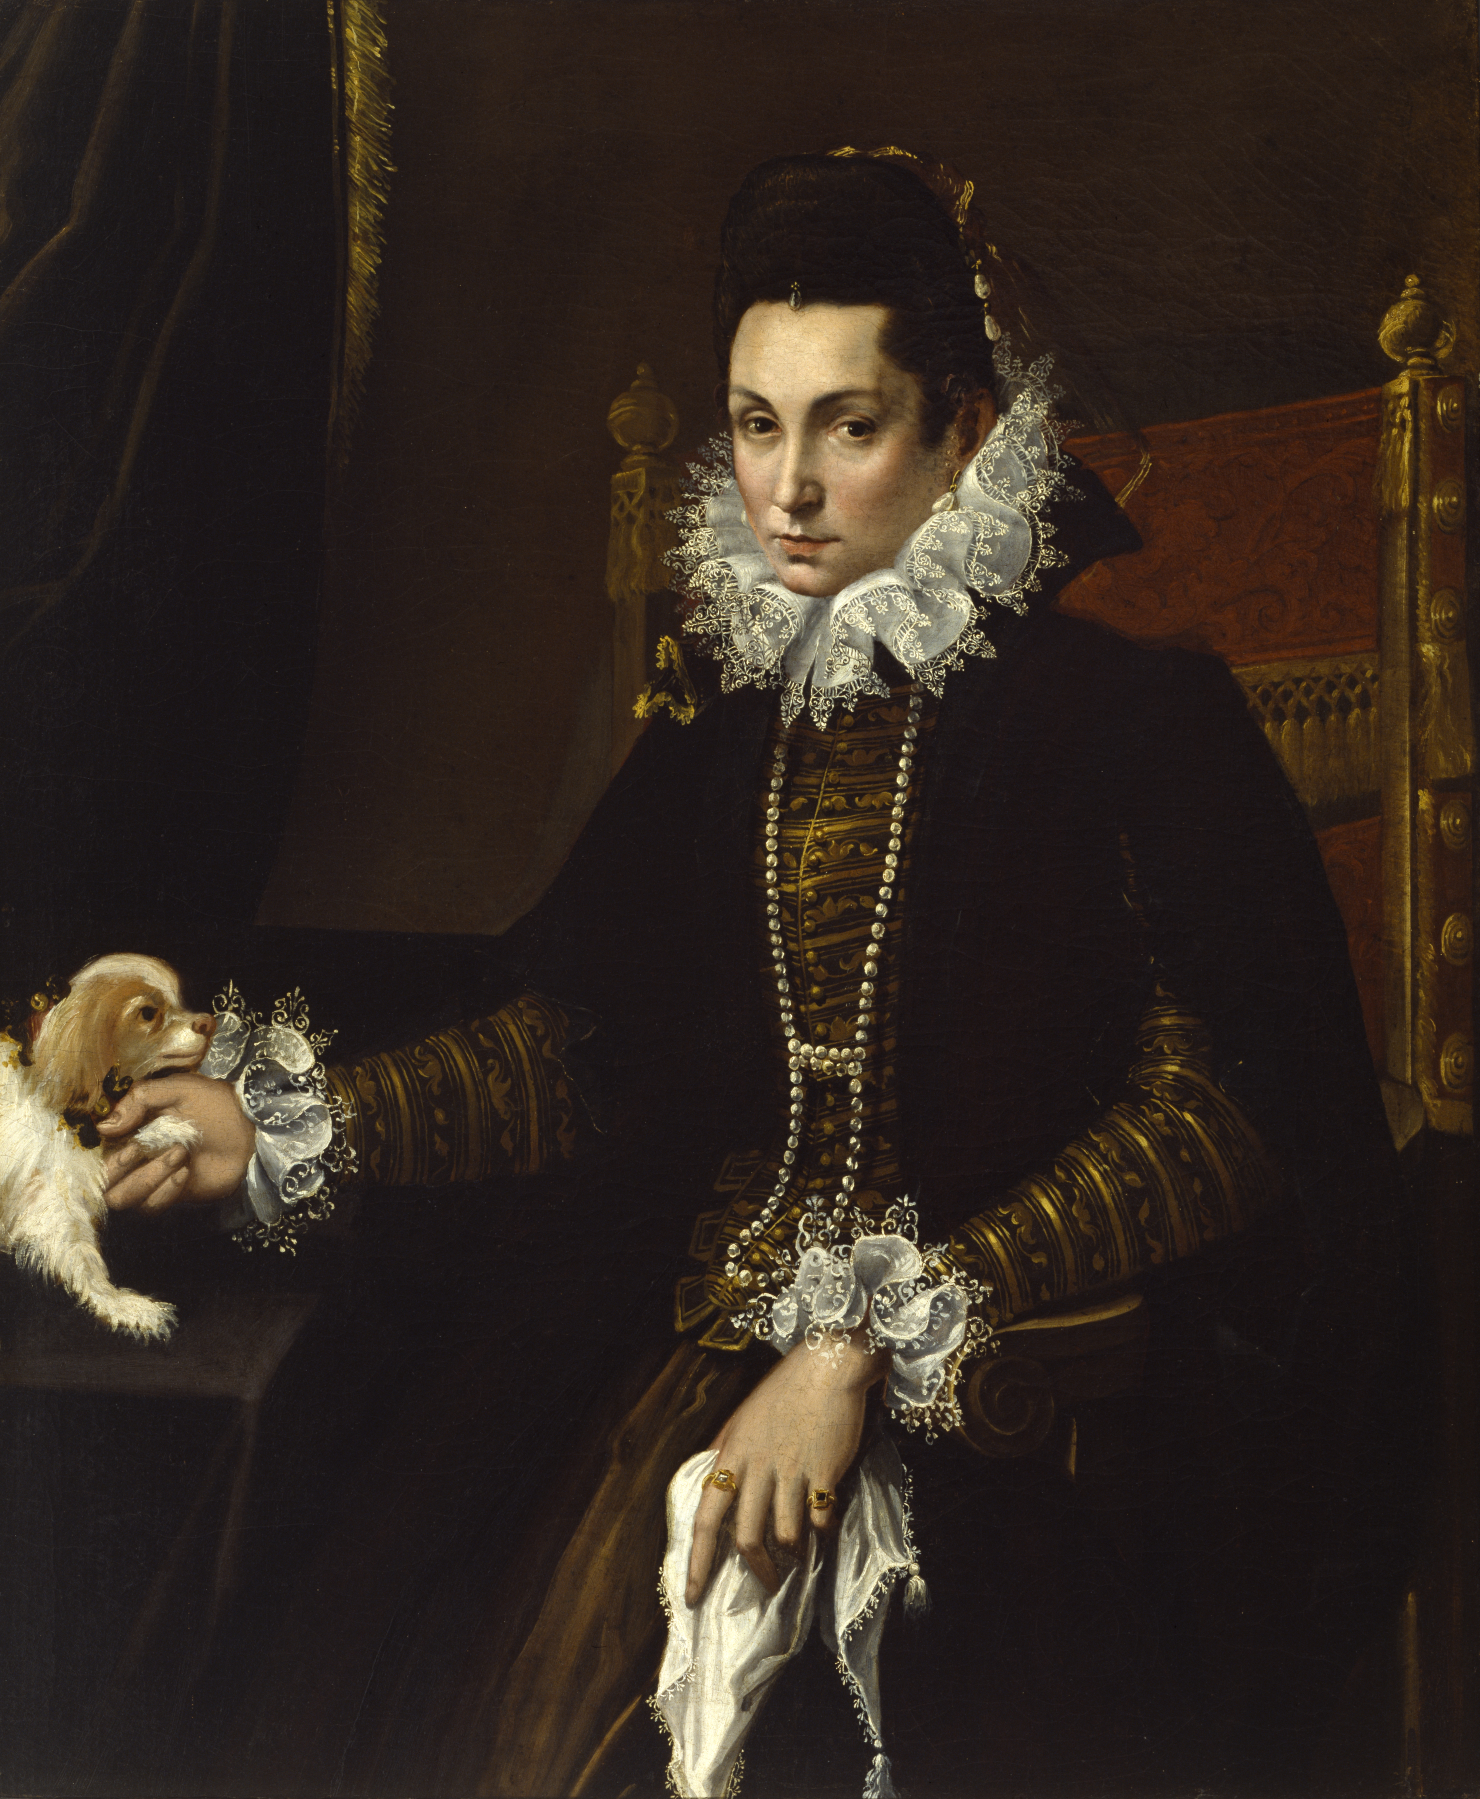 Portrait of Ginevra Aldrovandi Hercolani by Lavinia Fontana, 1595